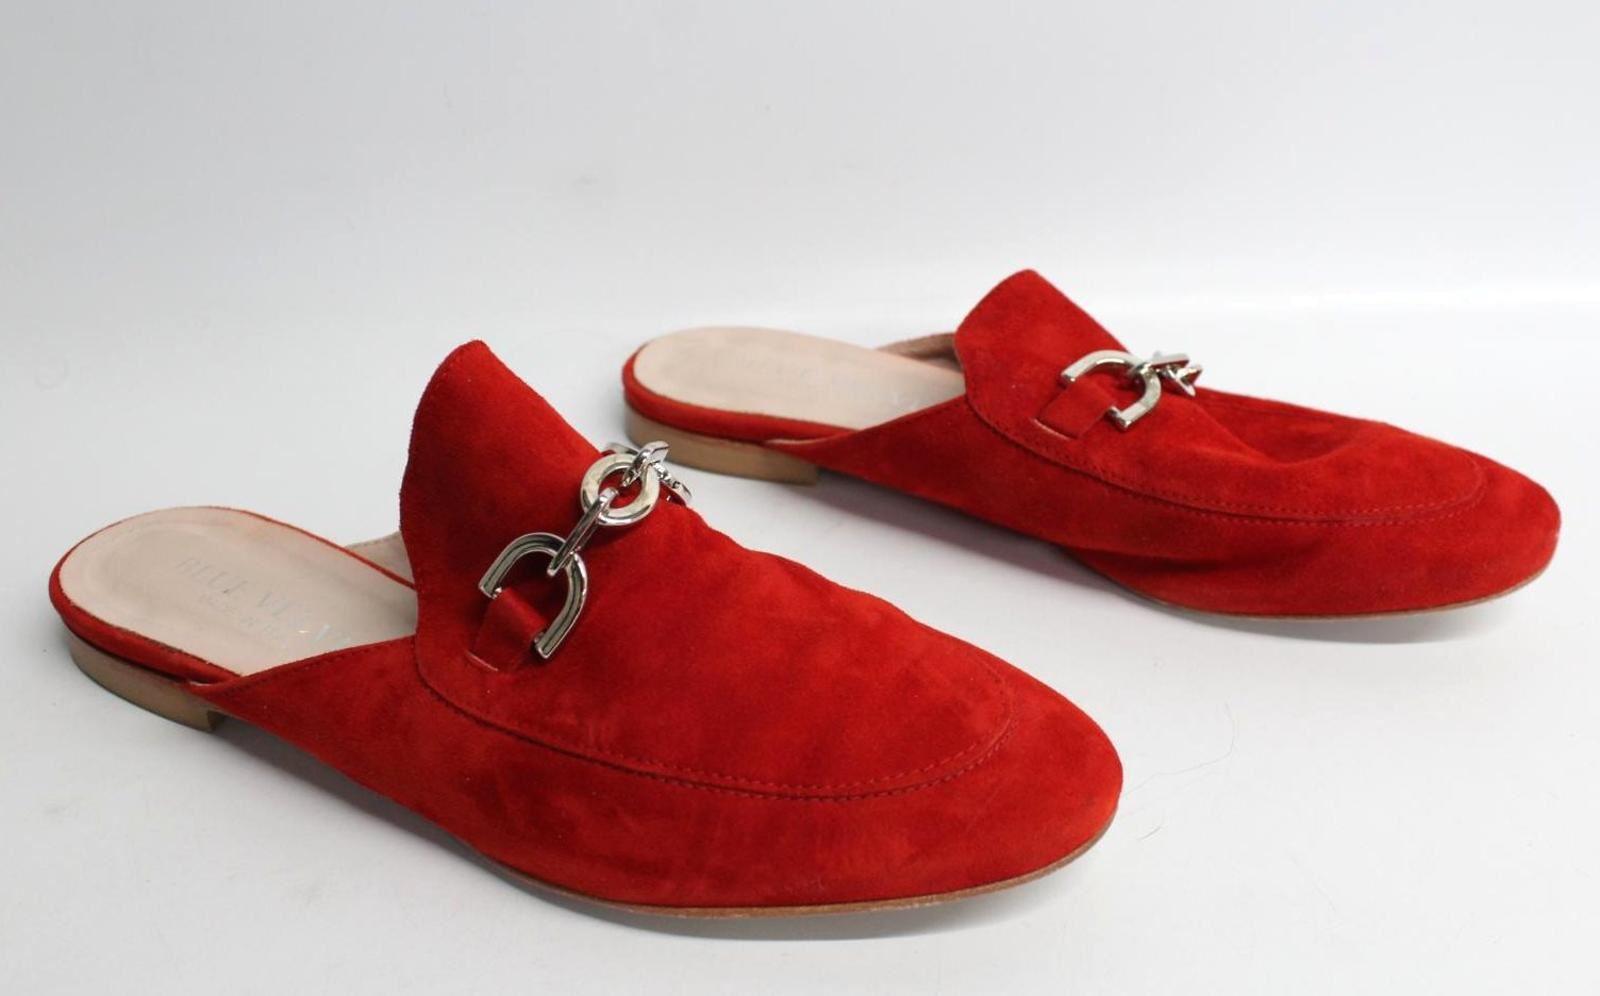 BLUE-VELVET-Ladies-Red-Suede-Mules-Open-Heel-Round-Toe-Flat-Shoes-UK6-EU39